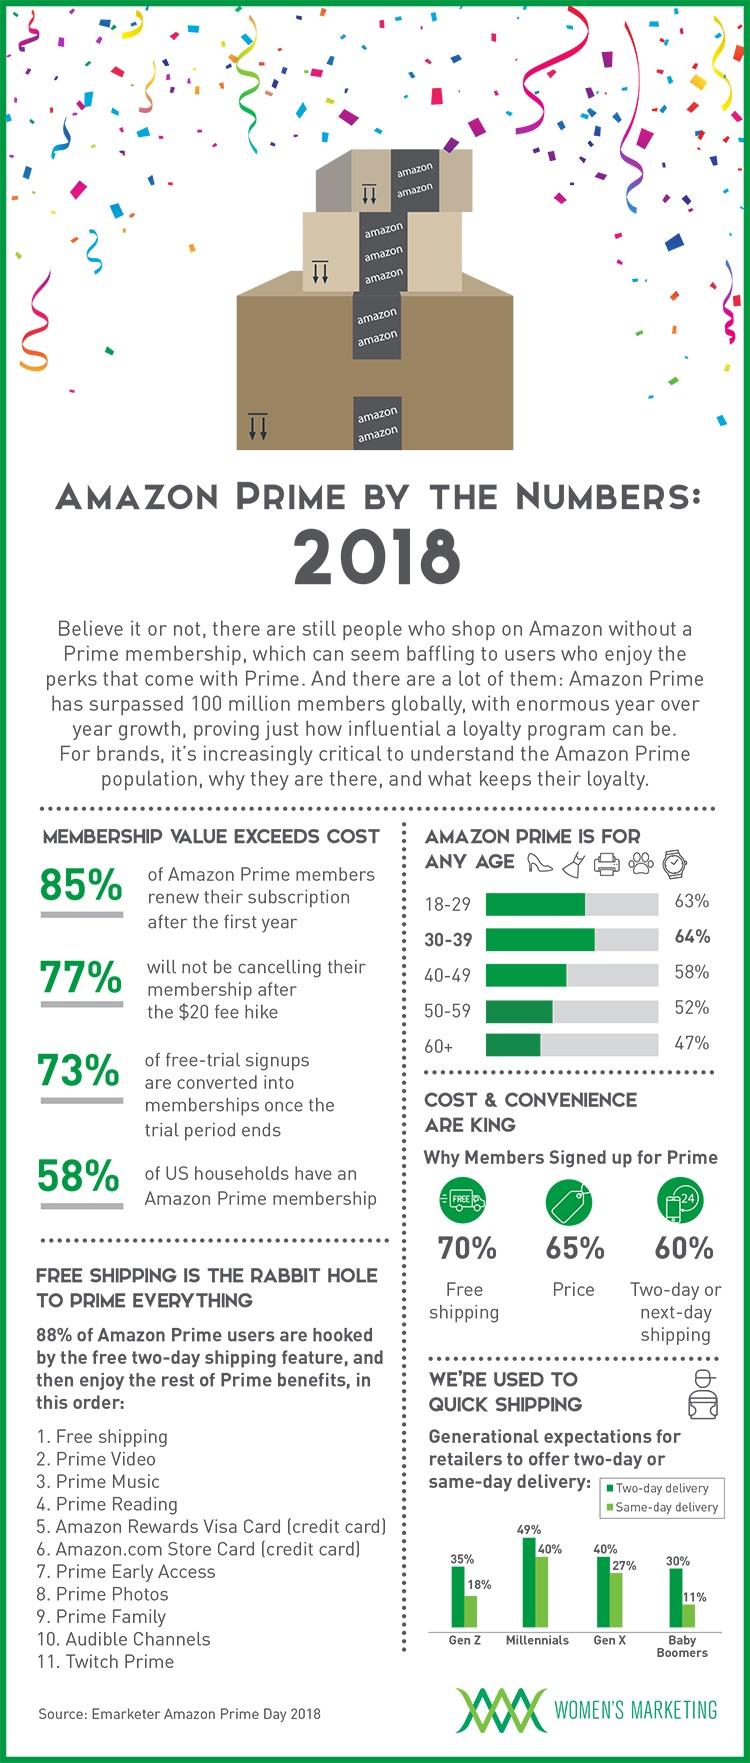 AmazonPrime2018v2_Infographic